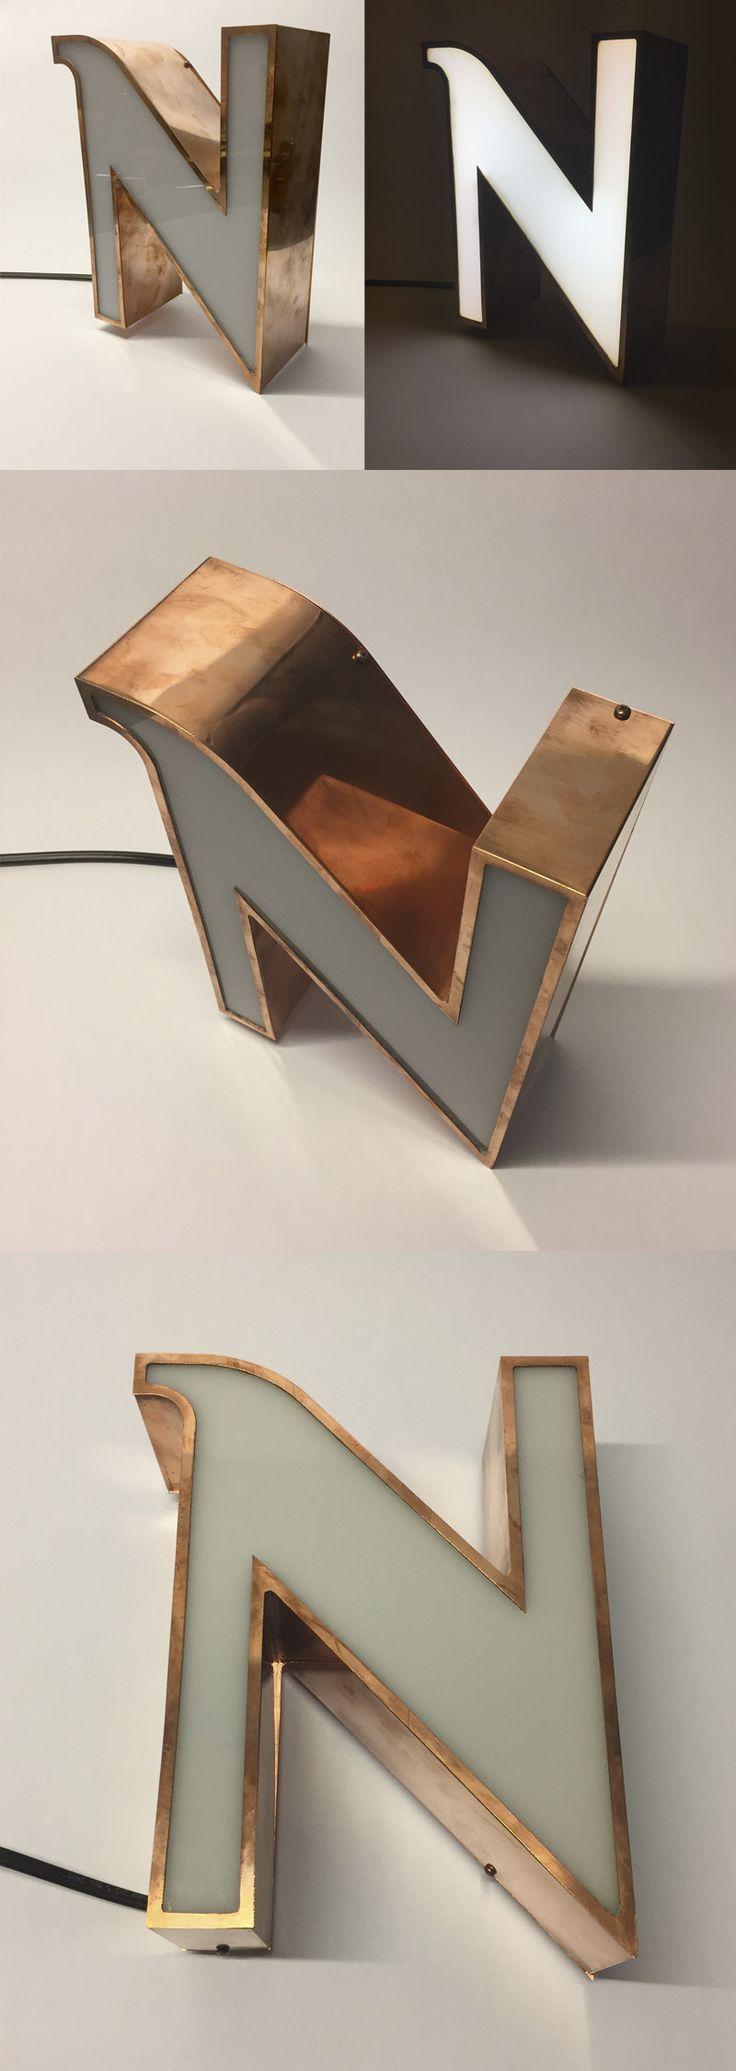 Sehr schöne Kupfer Metal LED-Buchstaben - beautiful copper metal LED channel lettering